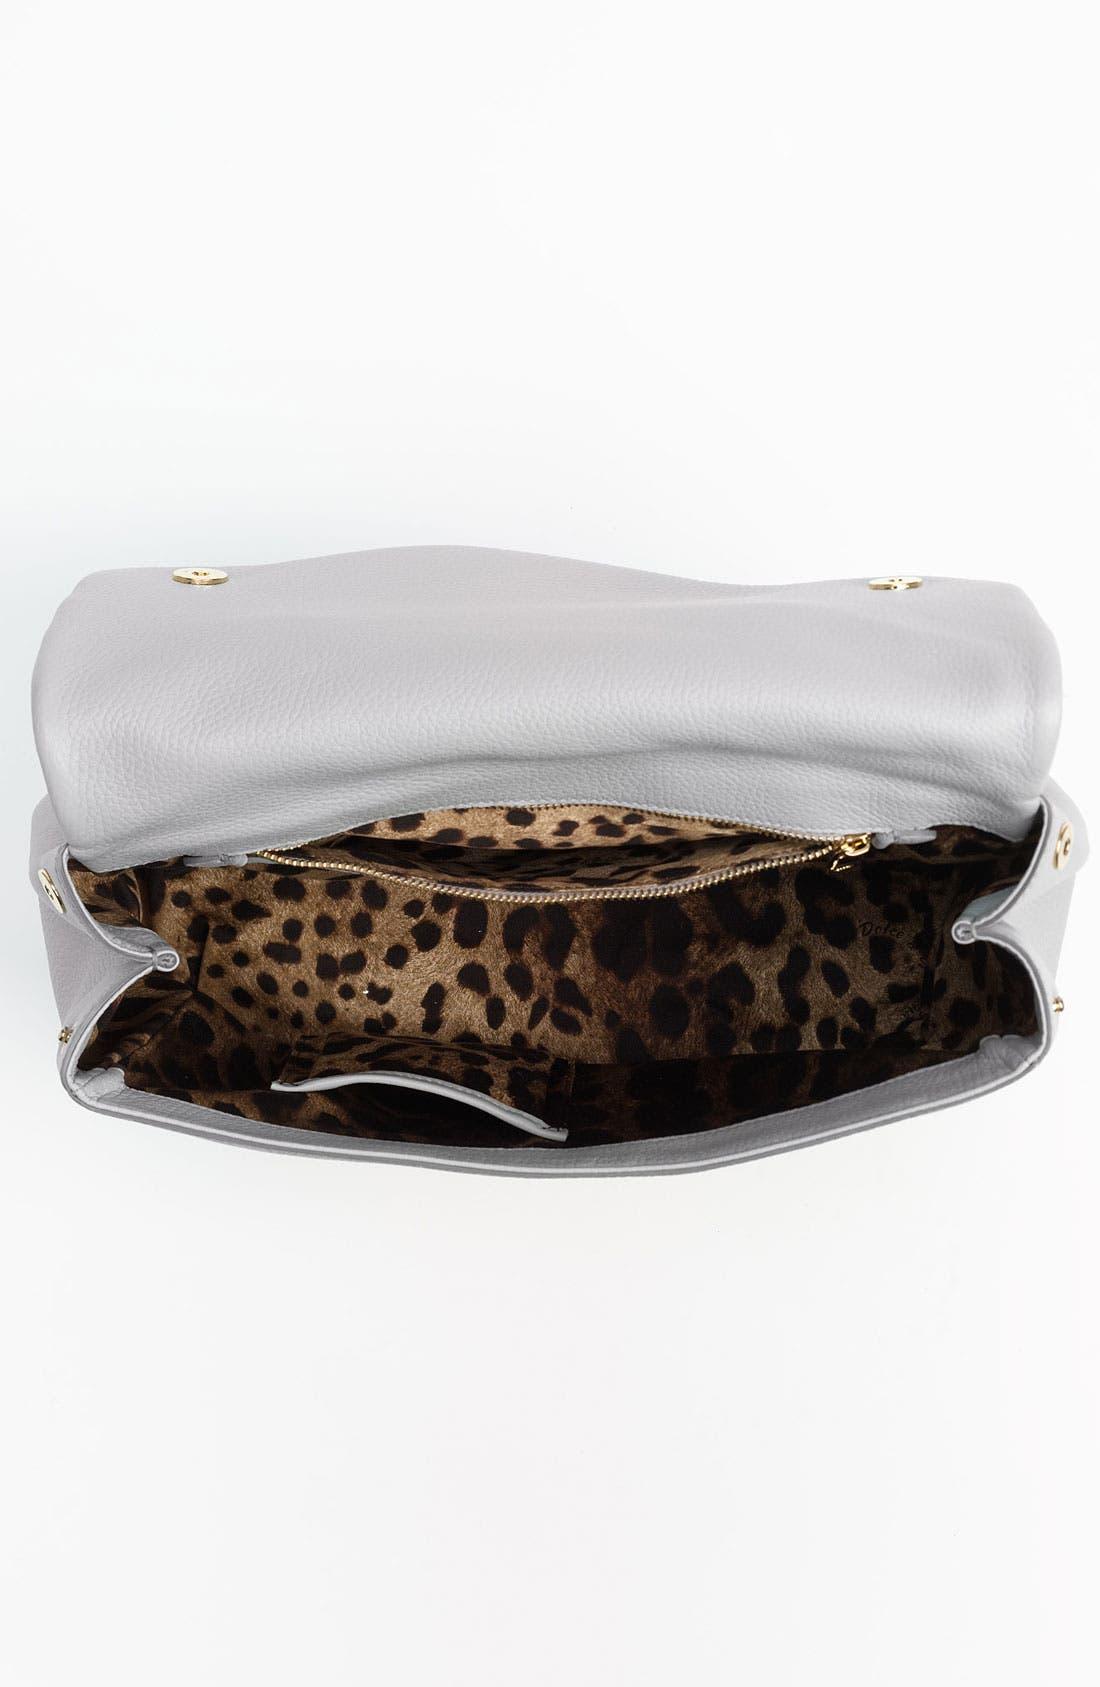 Alternate Image 3  - Dolce&Gabbana 'Miss Sicily Soft' Leather Satchel